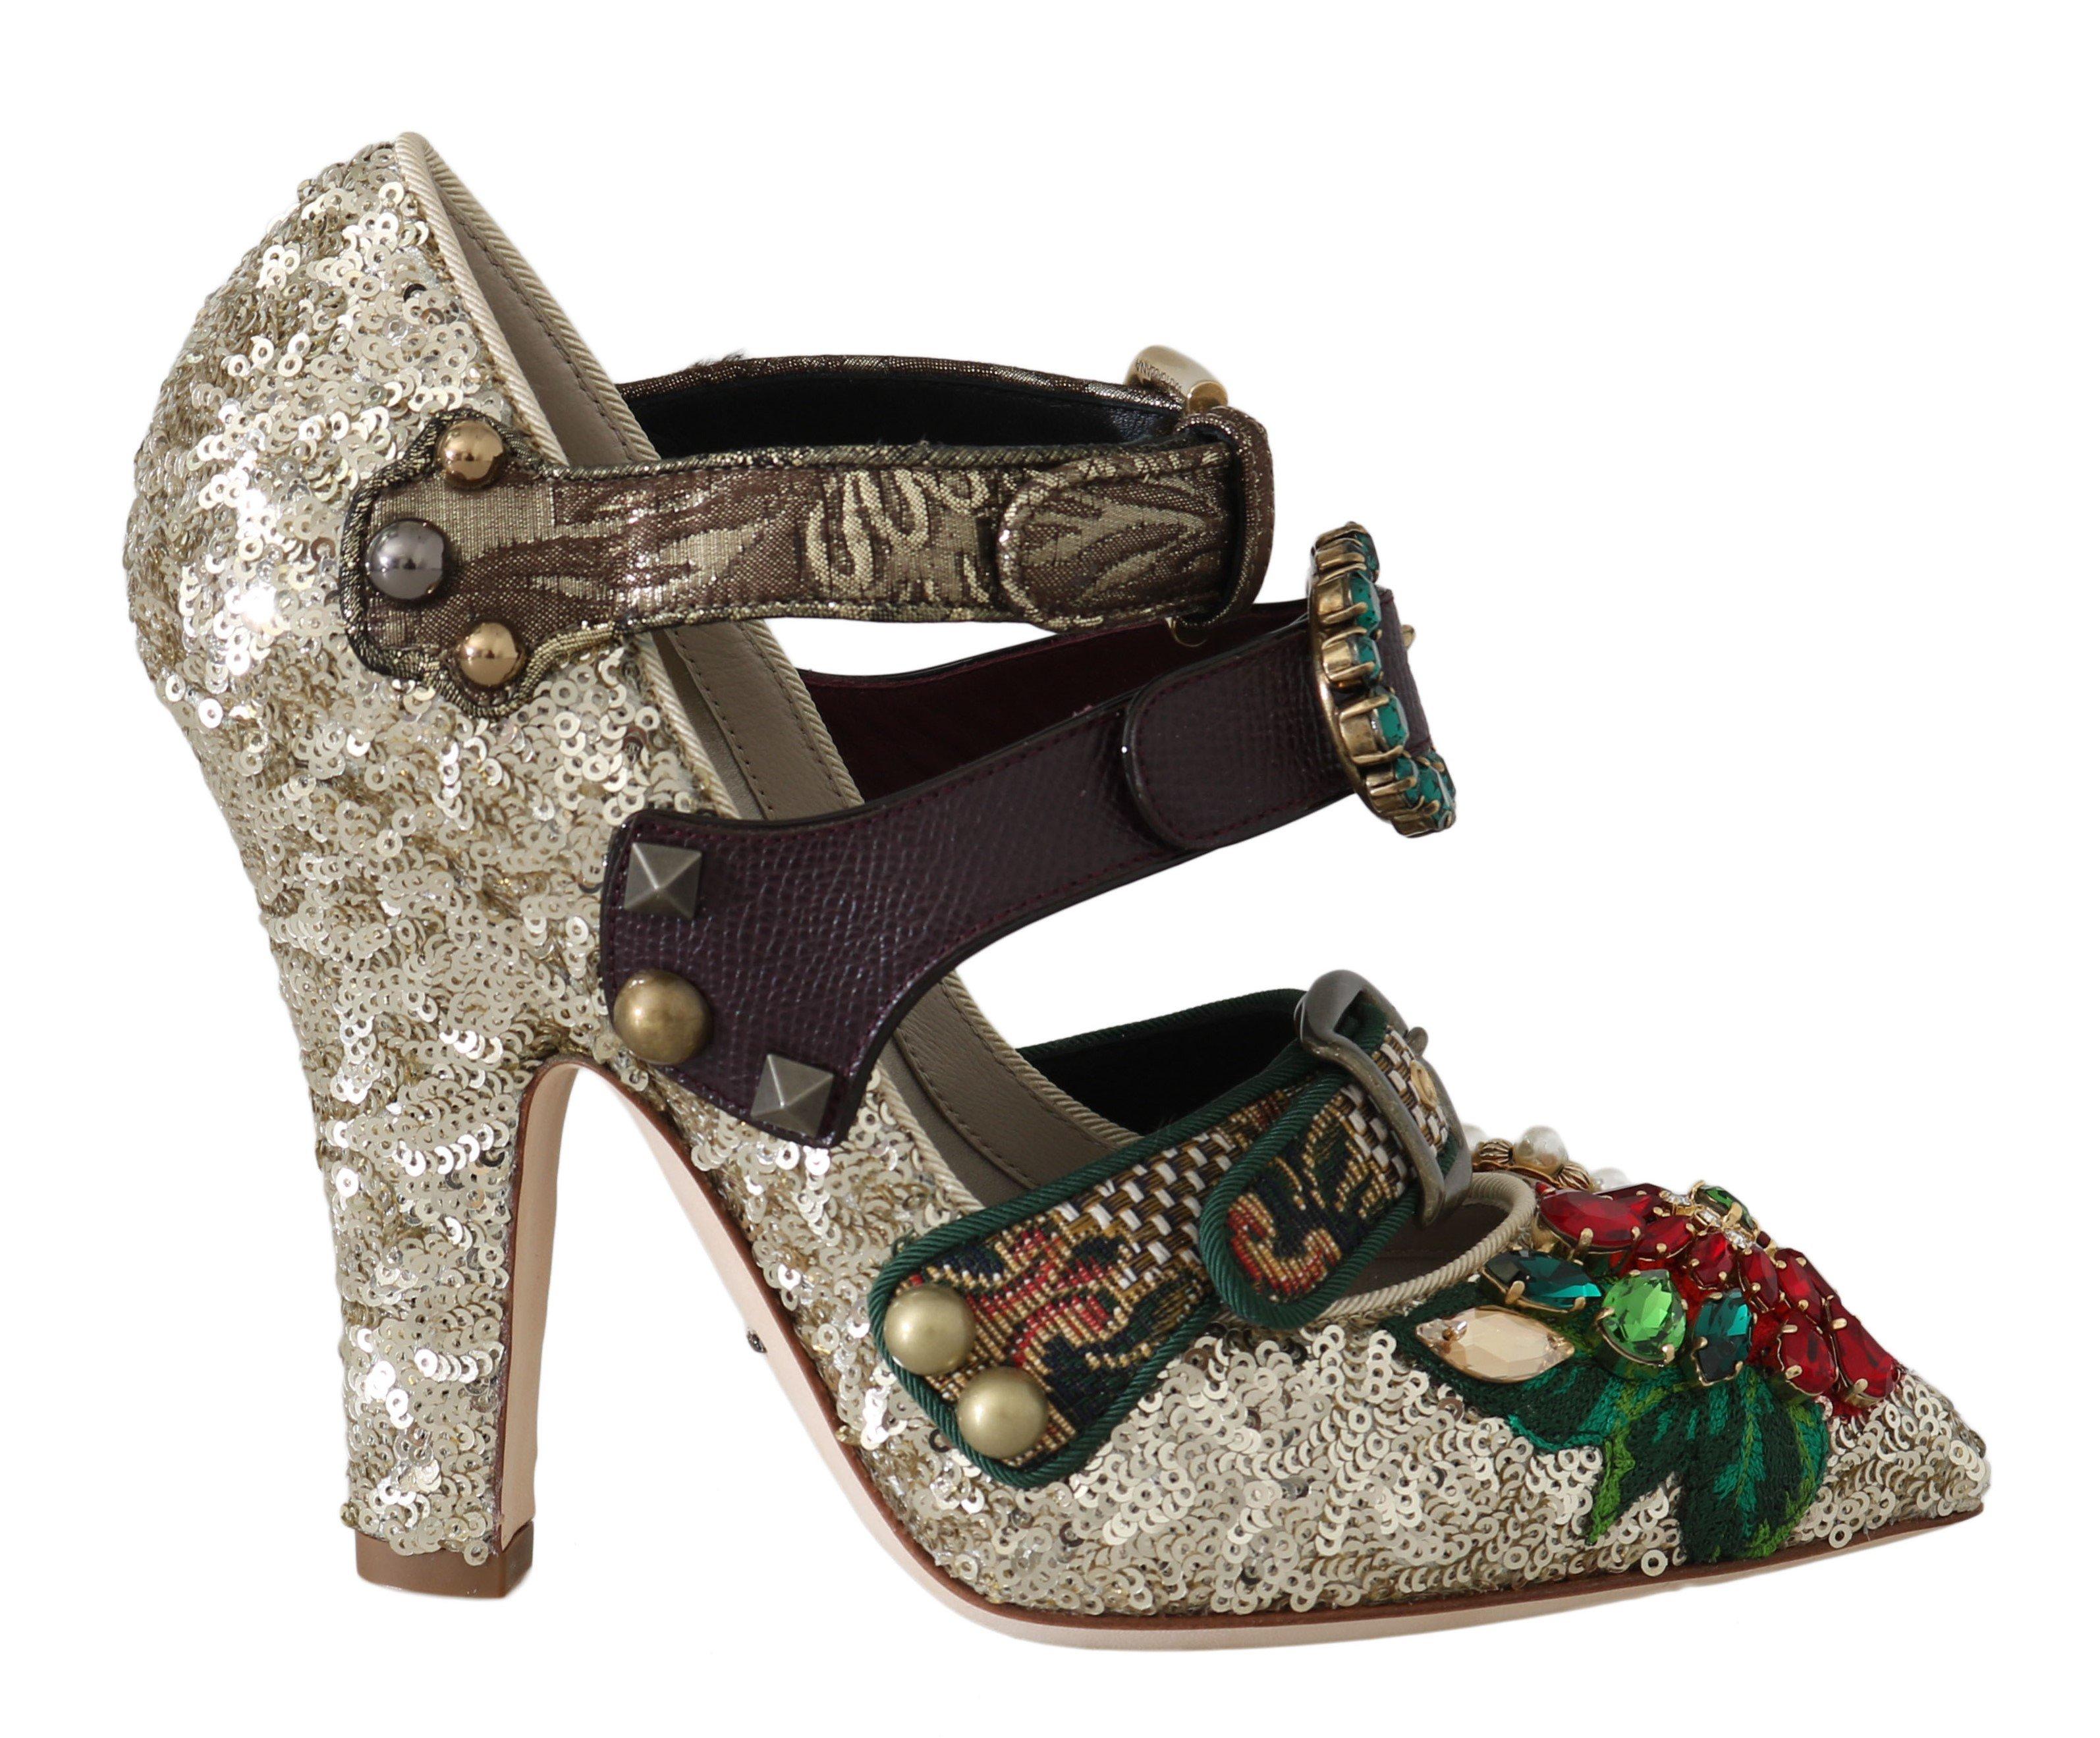 Dolce & Gabbana Women's Sequined Crystal Studs Heels Gold LA5661 - EU39.5/US9